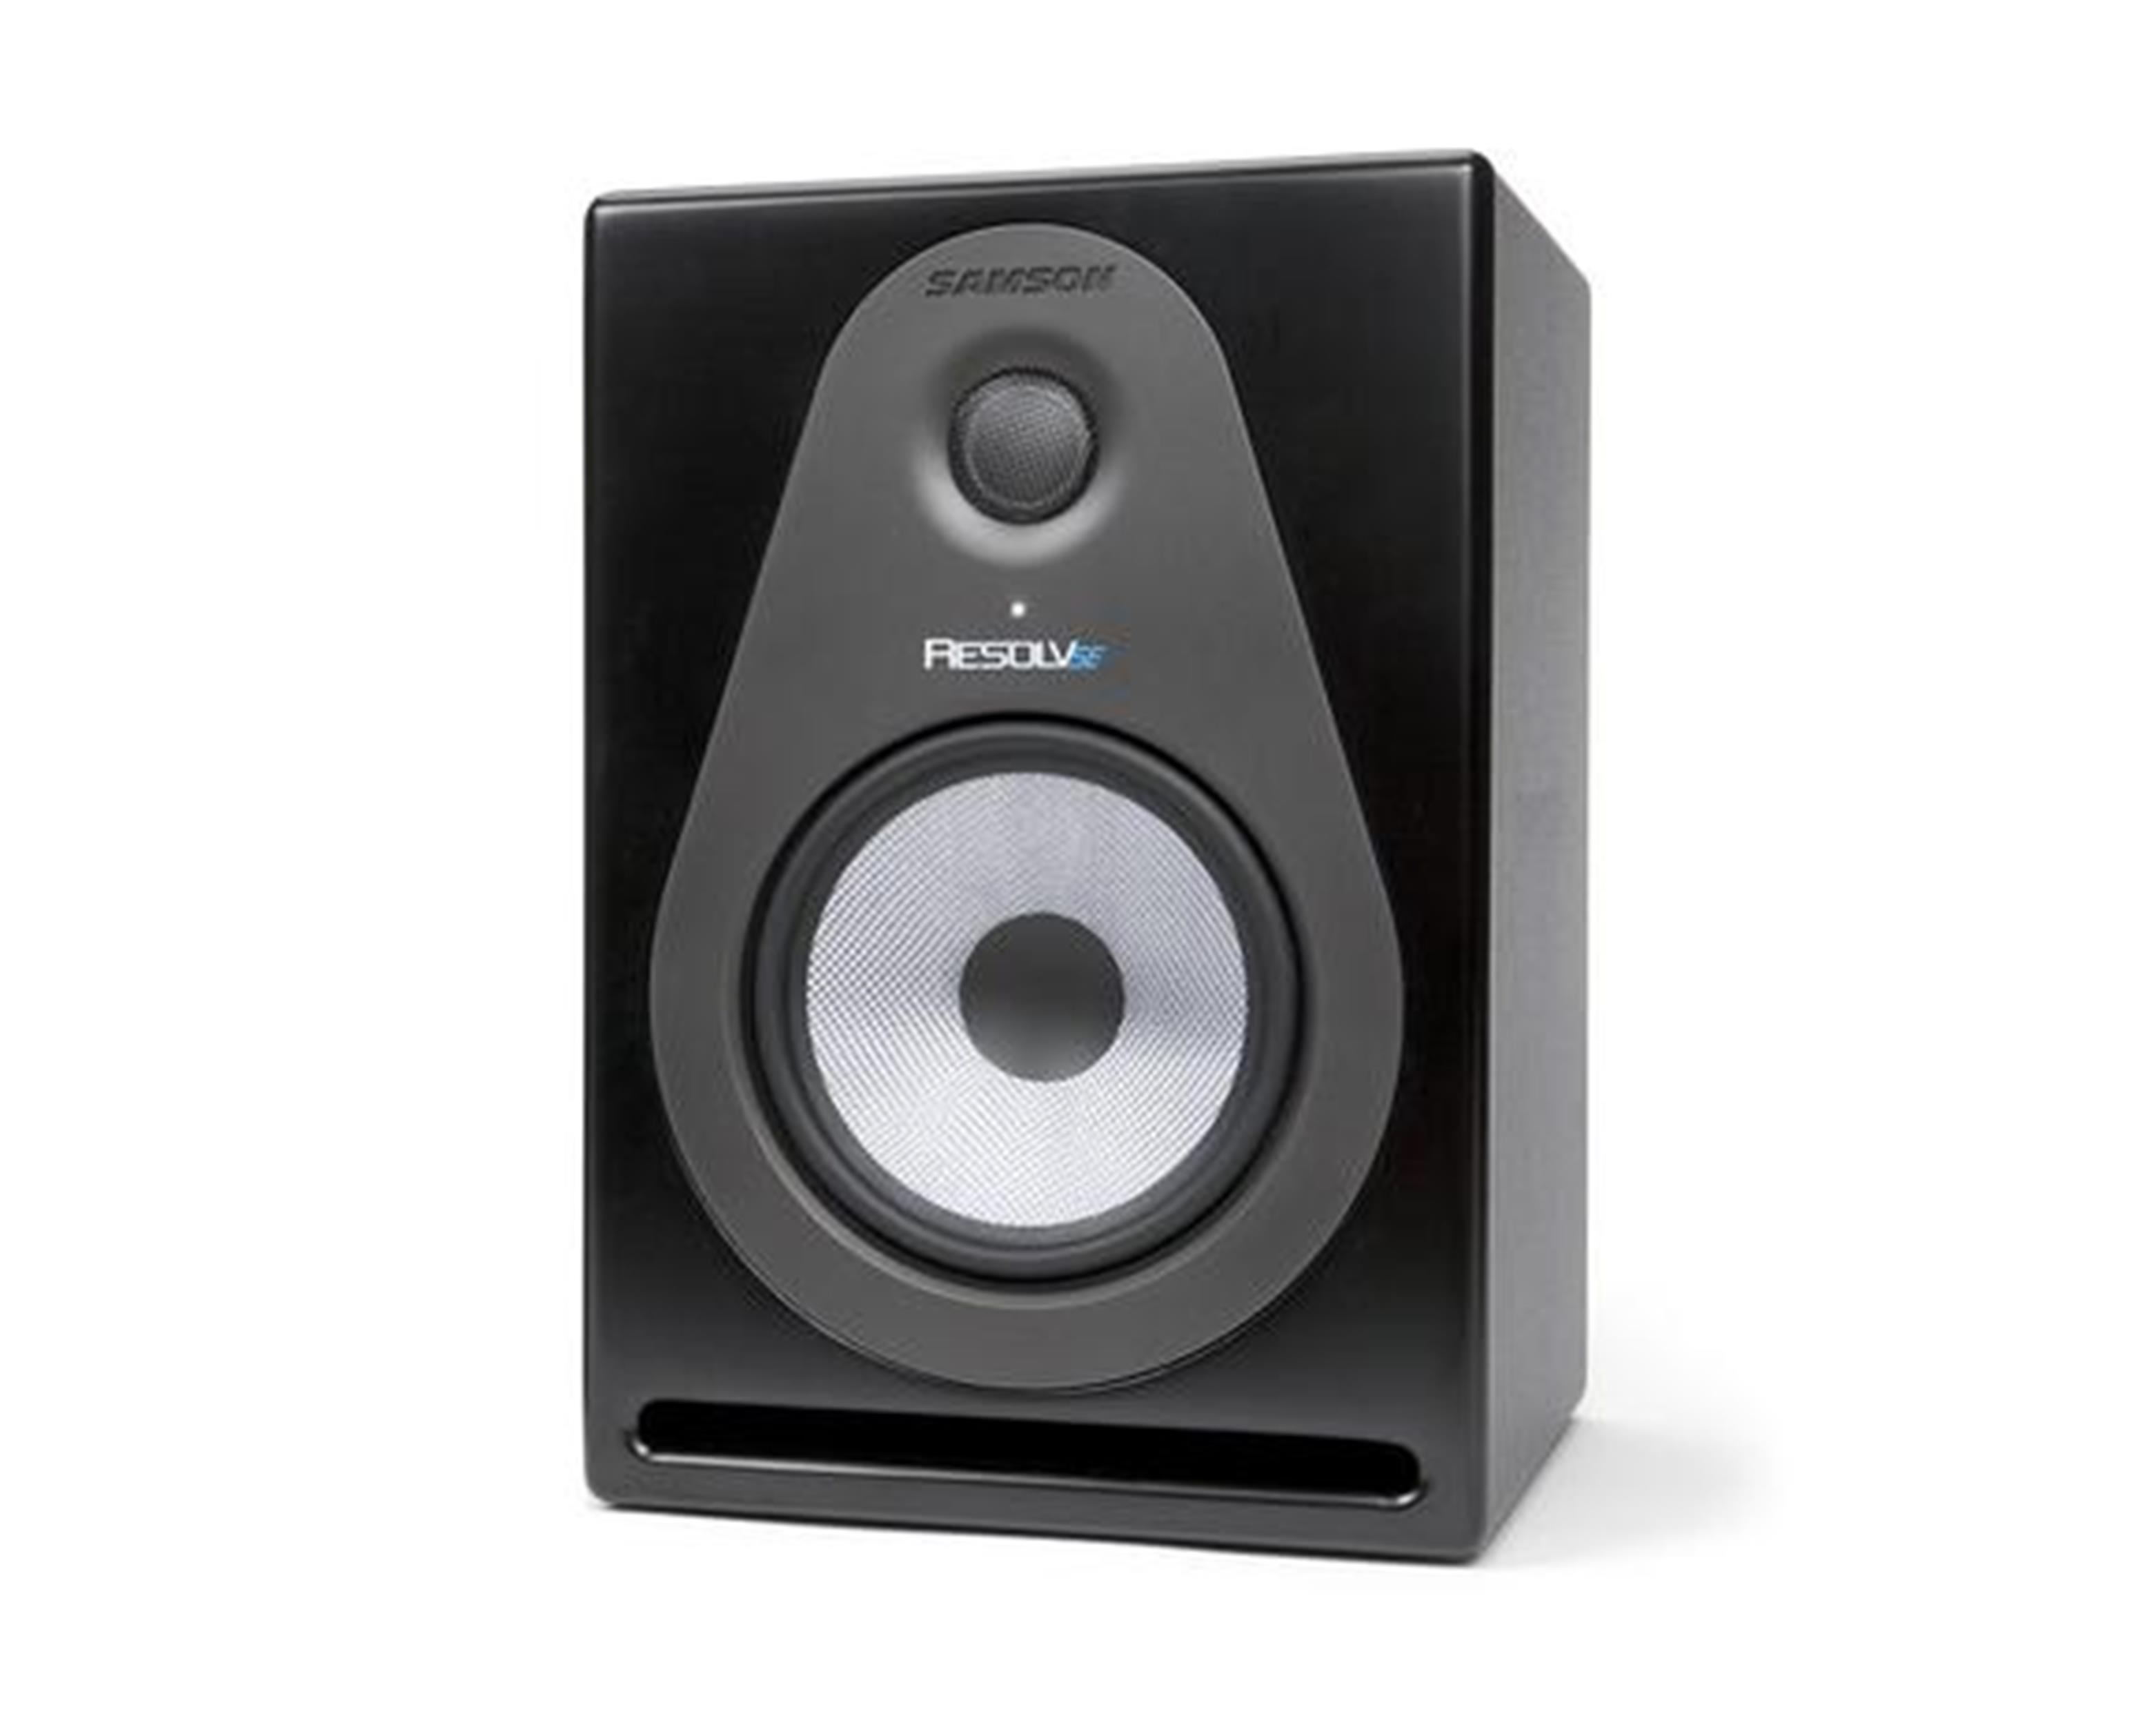 Samson RESOLV SE6 - Monitor Attivo Studio - 1 x 6